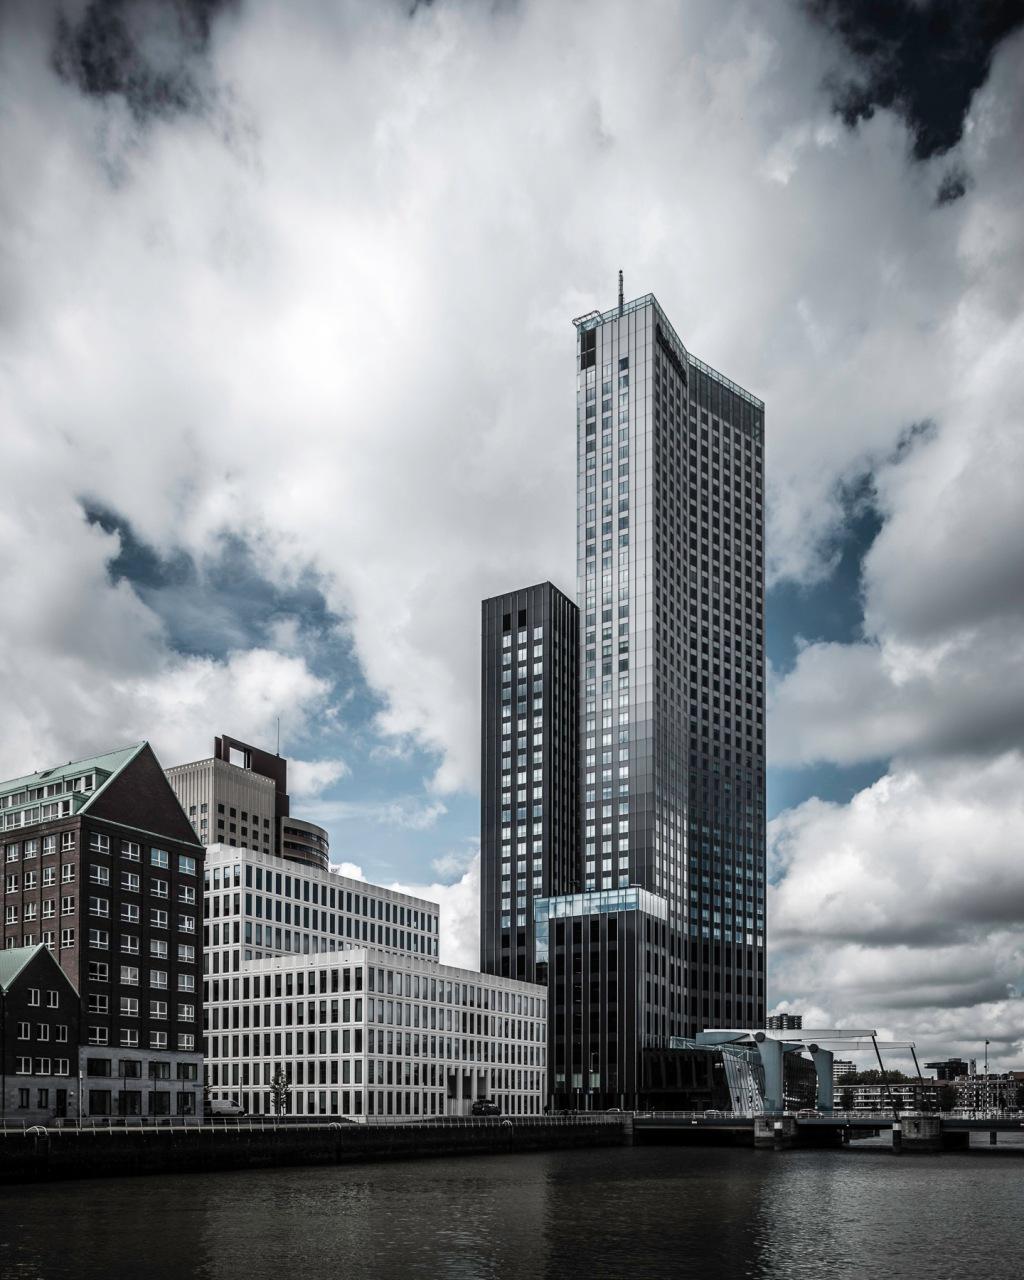 Maastoren Building Rotterdam - Mabry Campbell